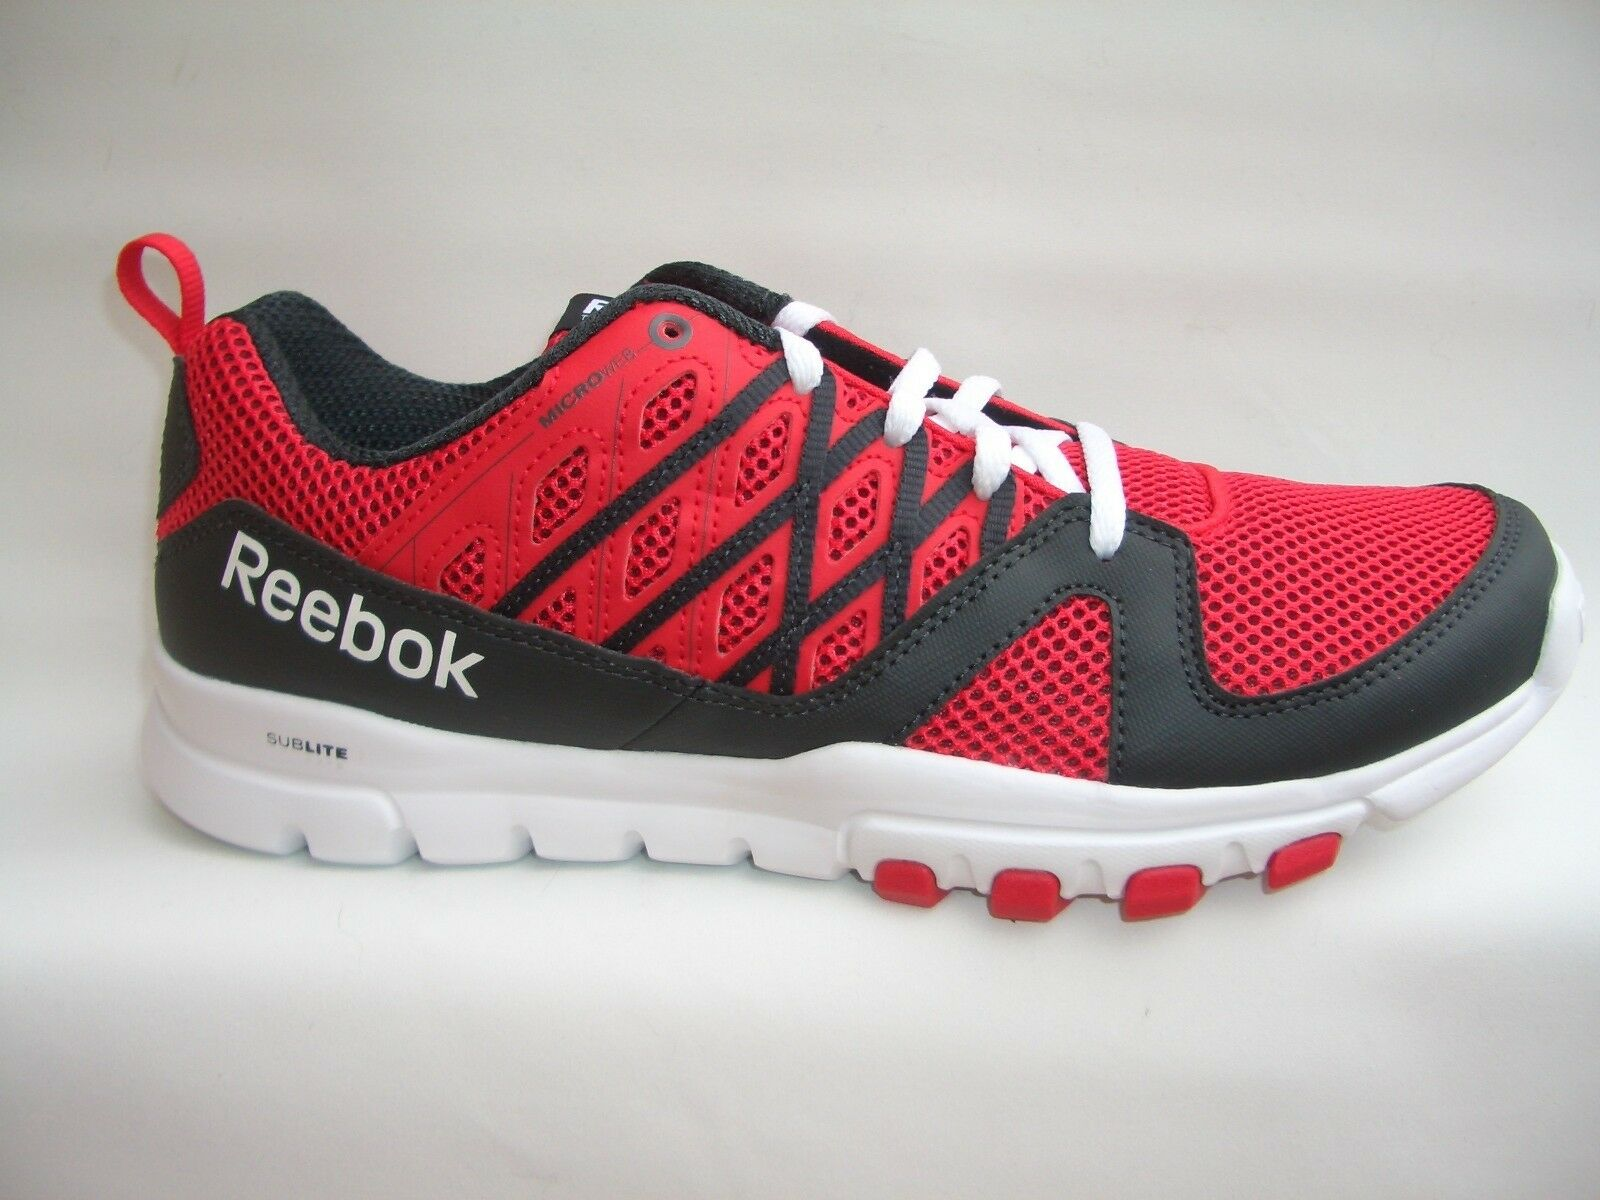 REEBOK SUBLITE TRAIN Sneaker RS 2 ROT/schwarz/WEISS  Sneaker TRAIN Classic Laufschuhe 9b3777